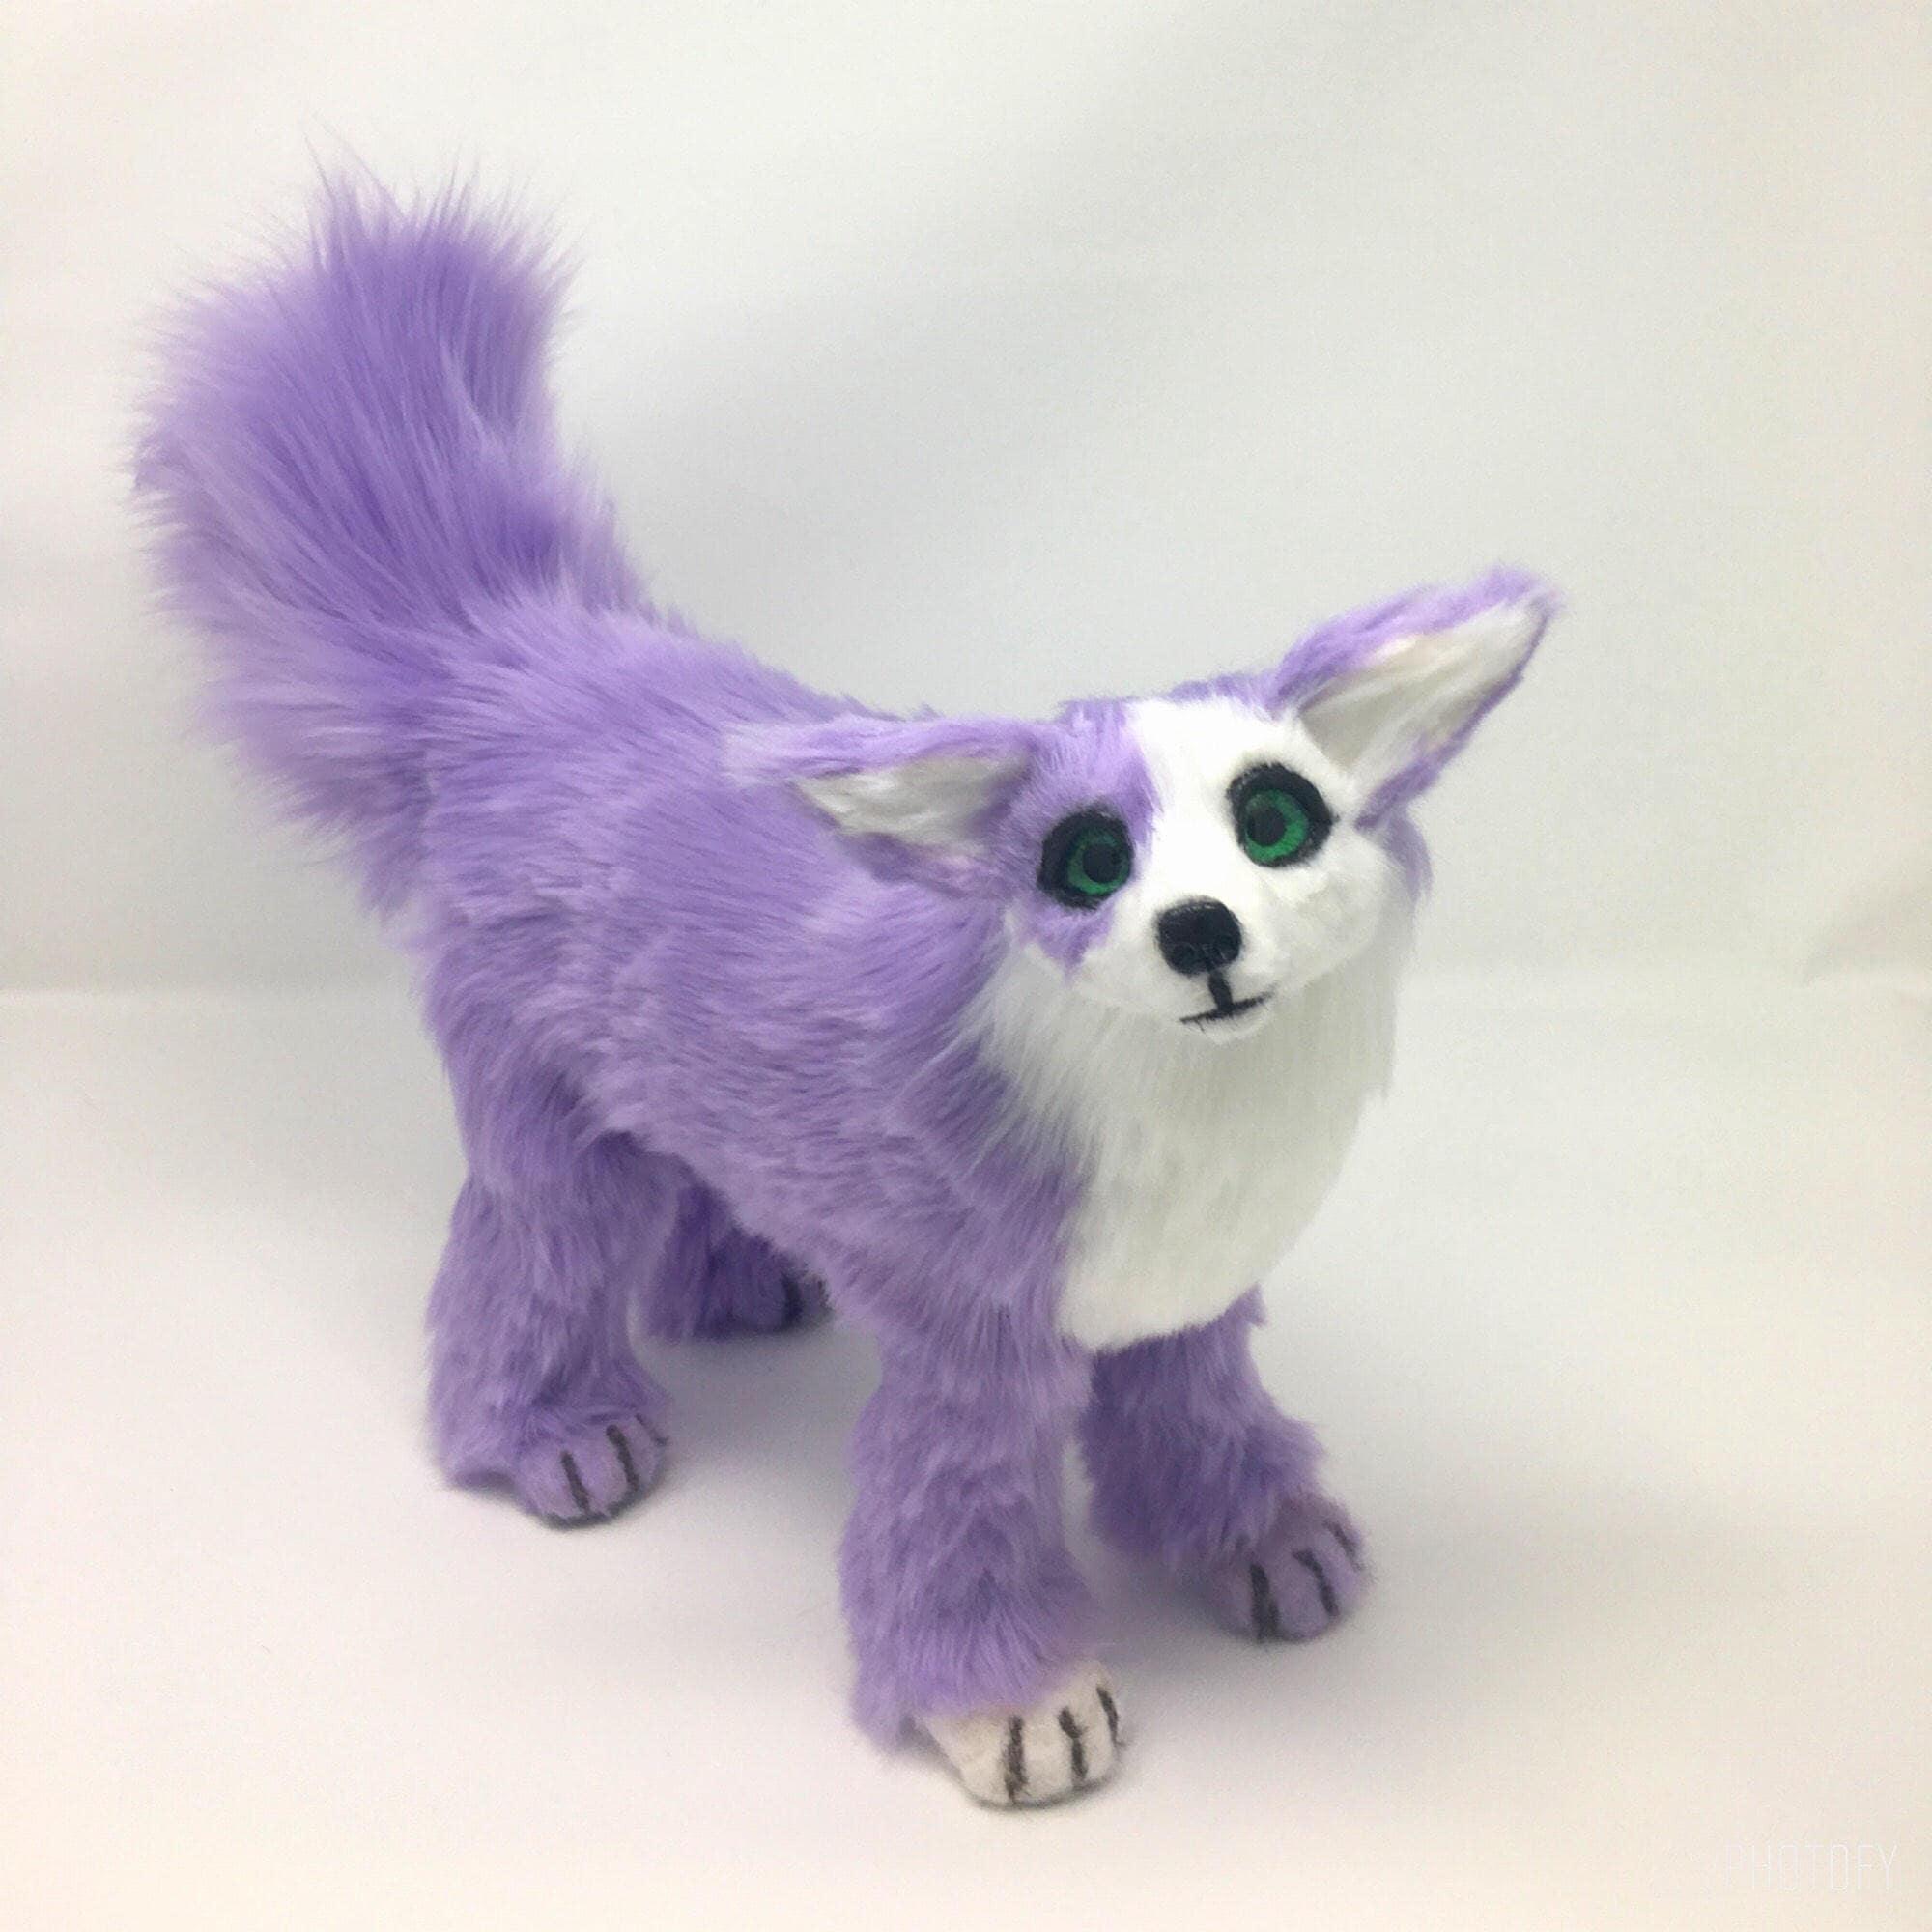 Poseable art doll animal lilac fox fantasy creature ooak art doll cute plush art doll Kora the lilac fennec fox